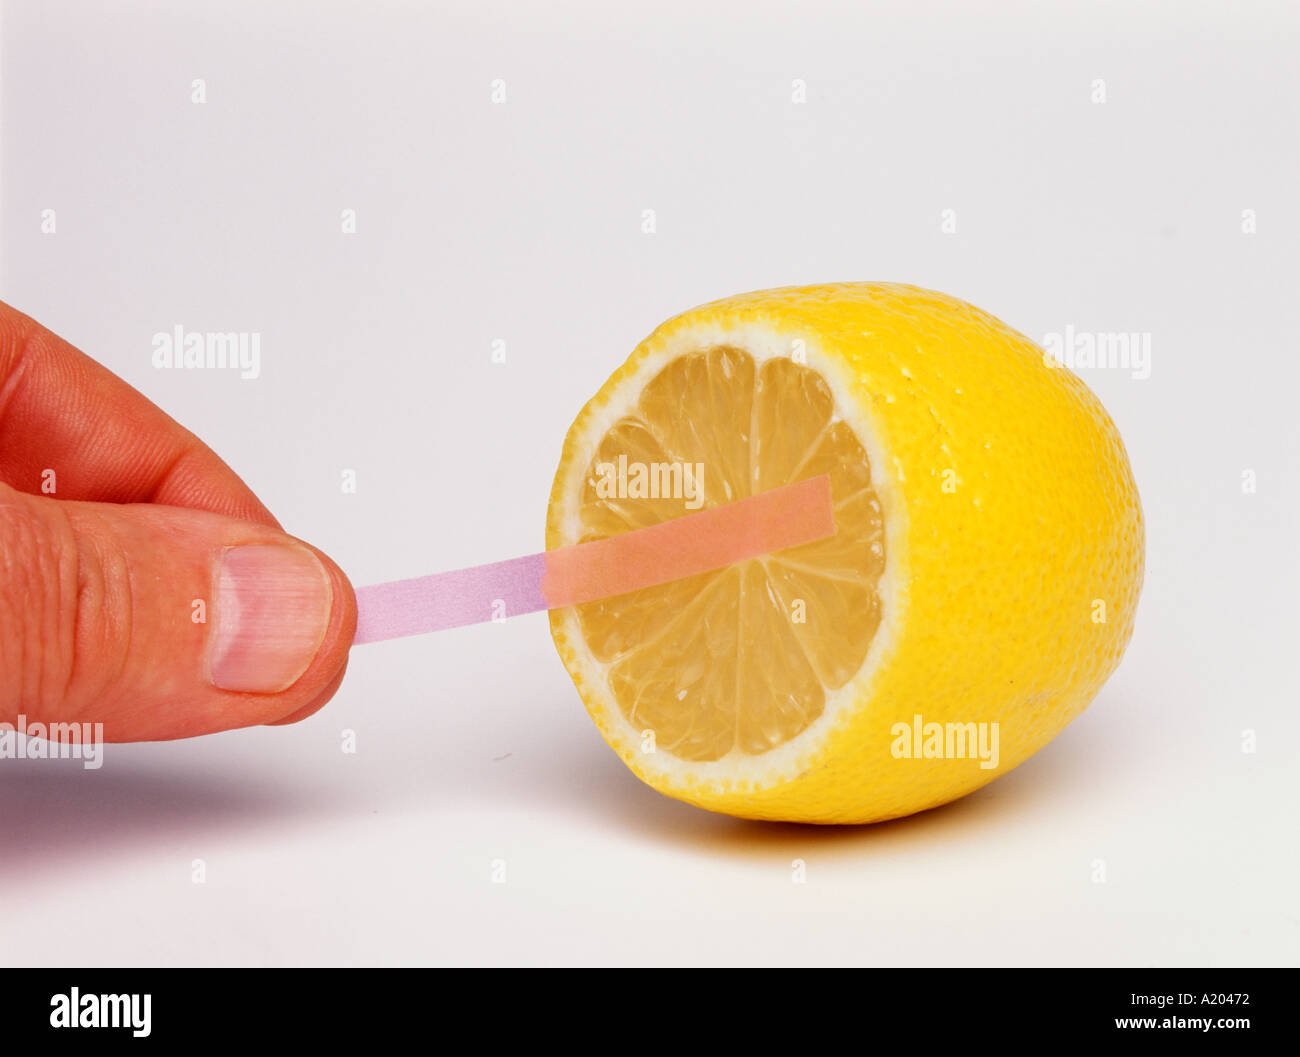 blue litmus paper turns red showing that lemon juice is